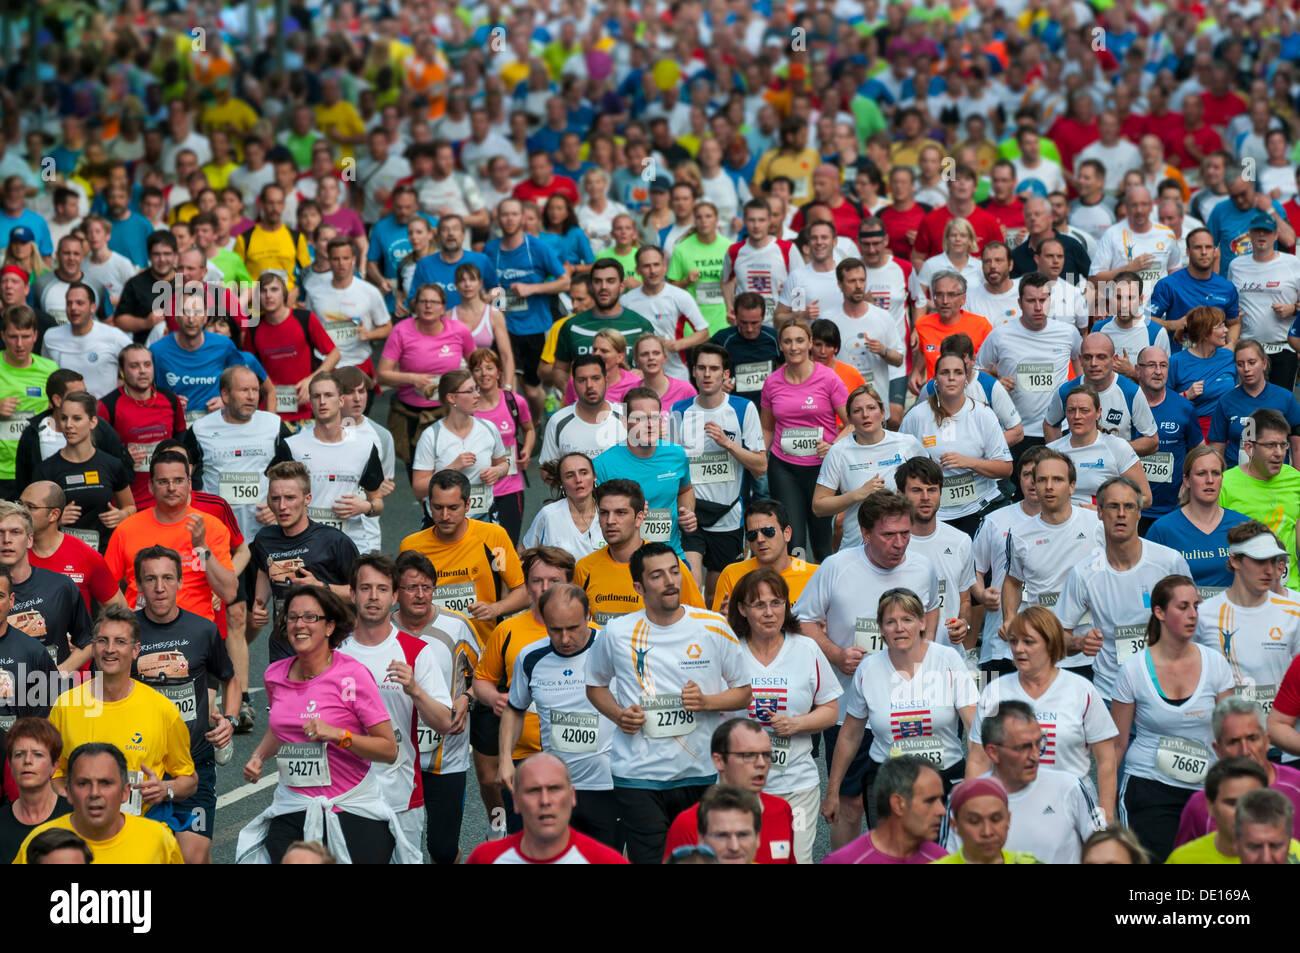 Field of runners at the J.P. Morgan Corporate Challenge Run, Westend, Frankfurt am Main, Hesse, Germany - Stock Image